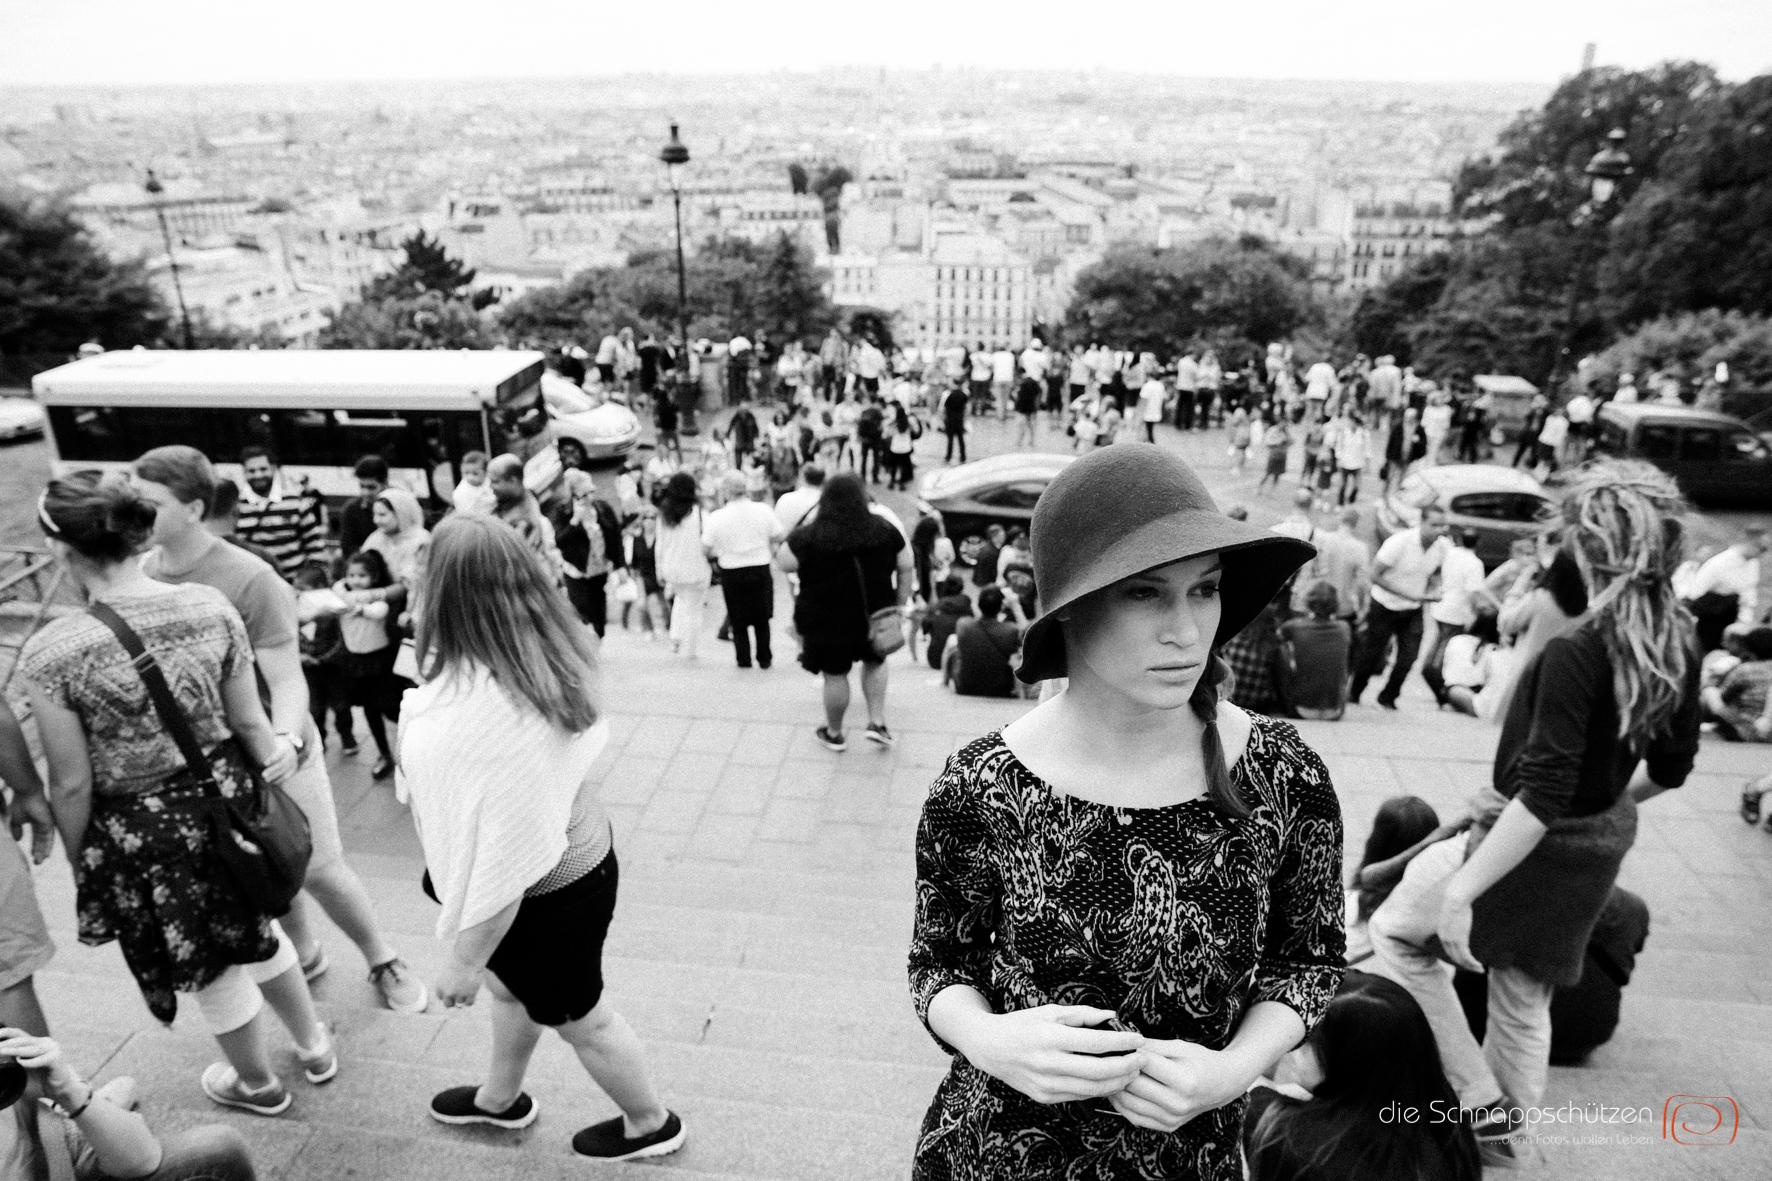 Street Photography in Paris am Montmartre